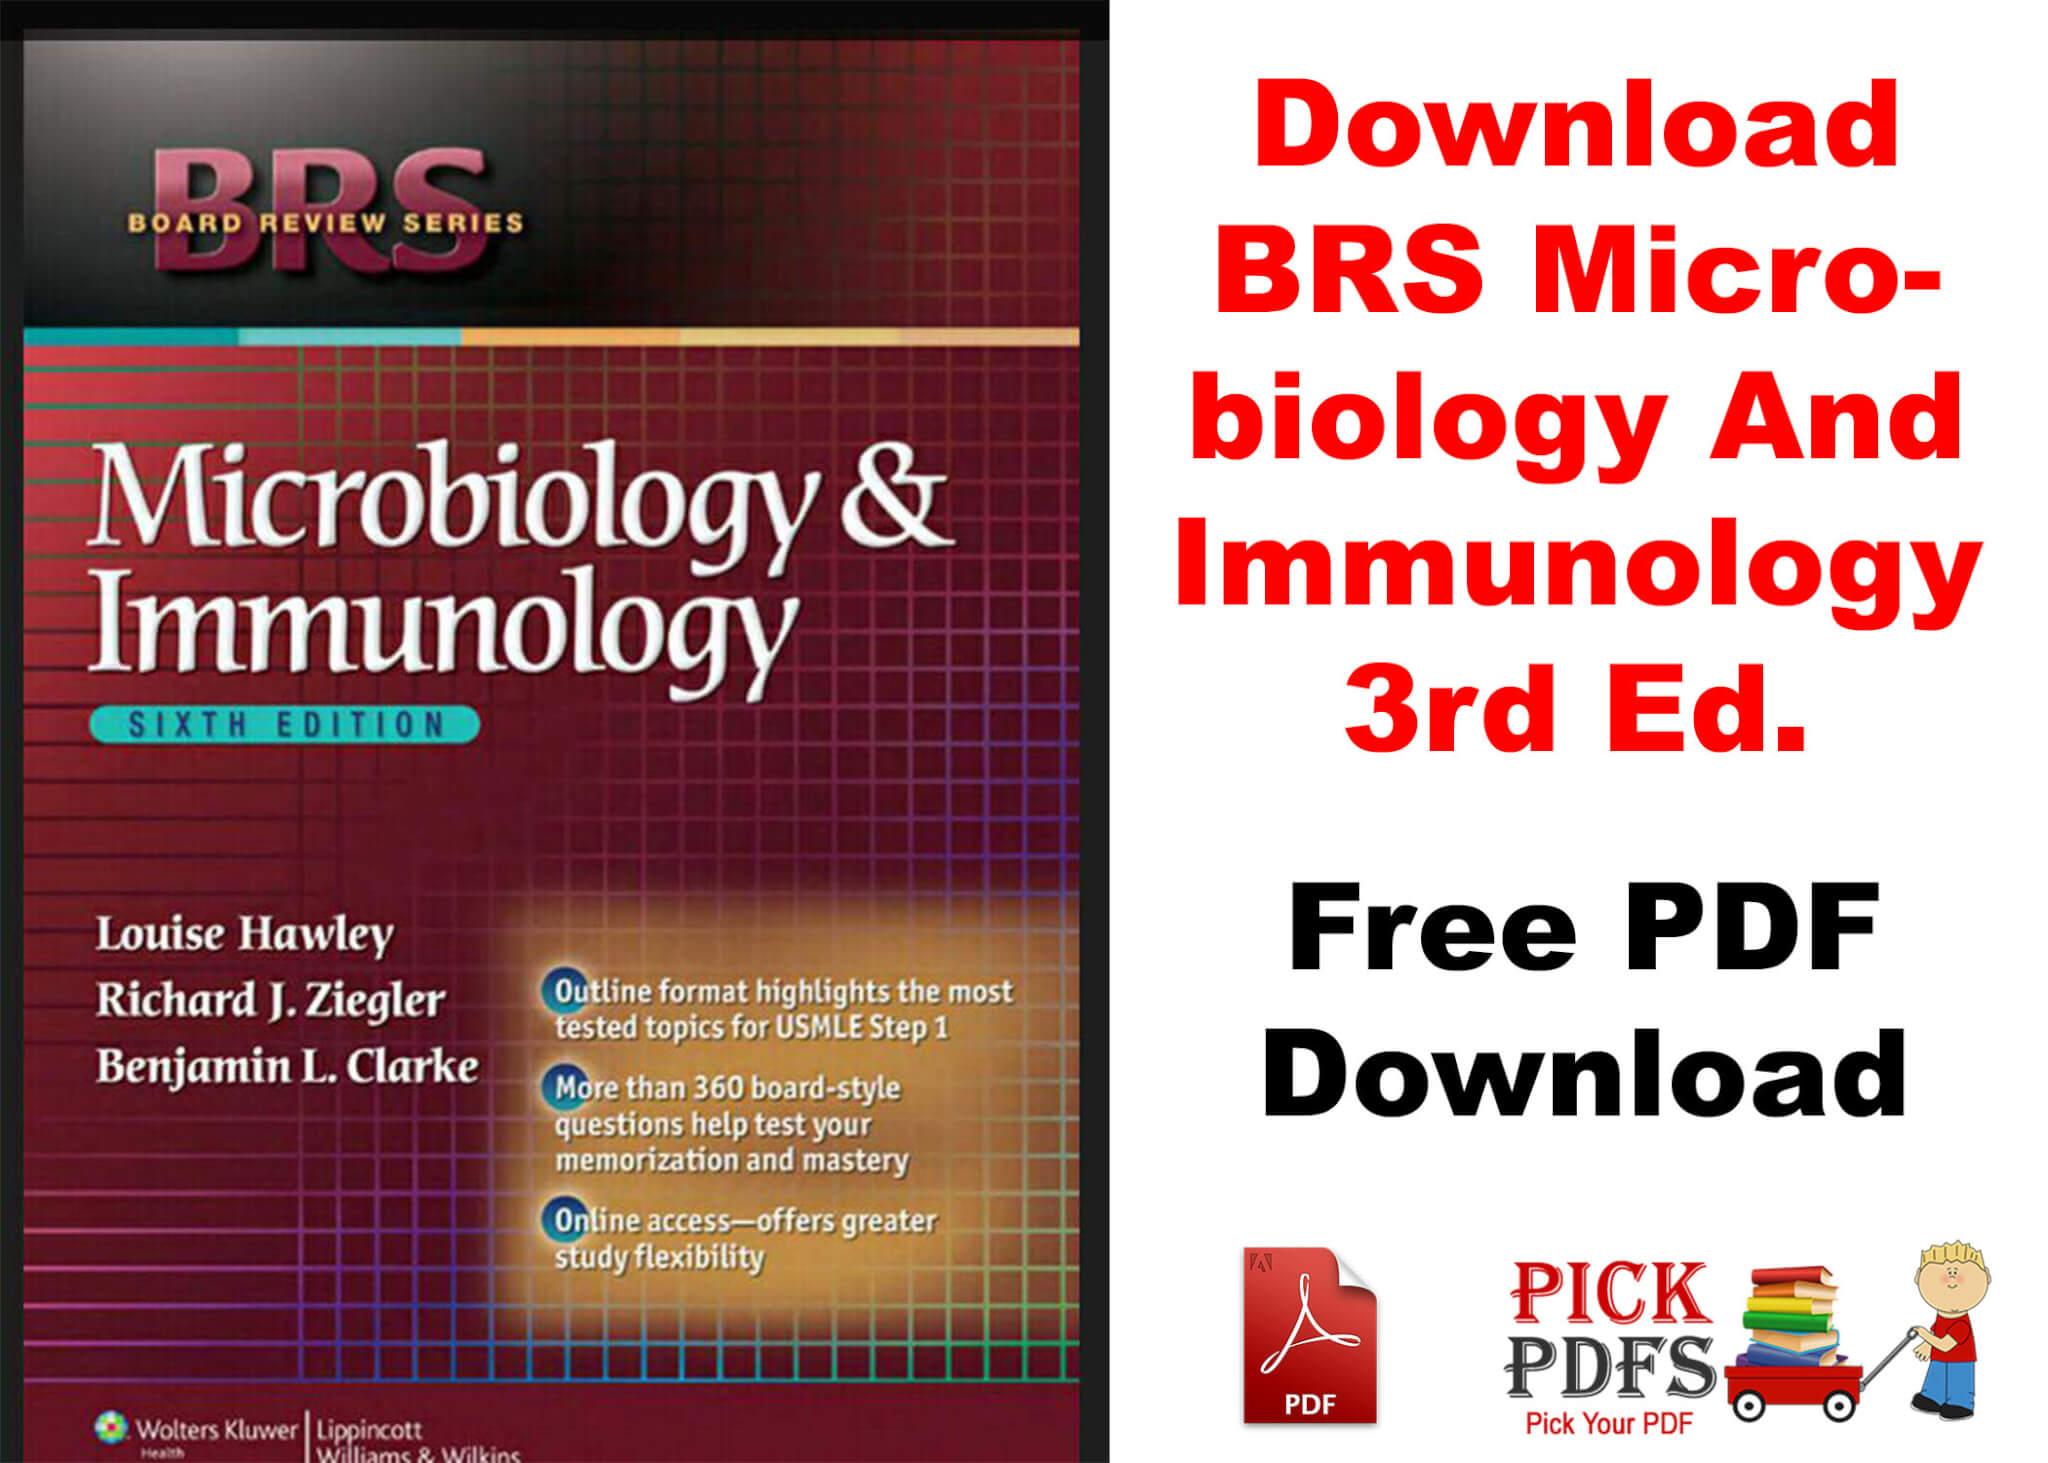 Download BRS Free Medical Book